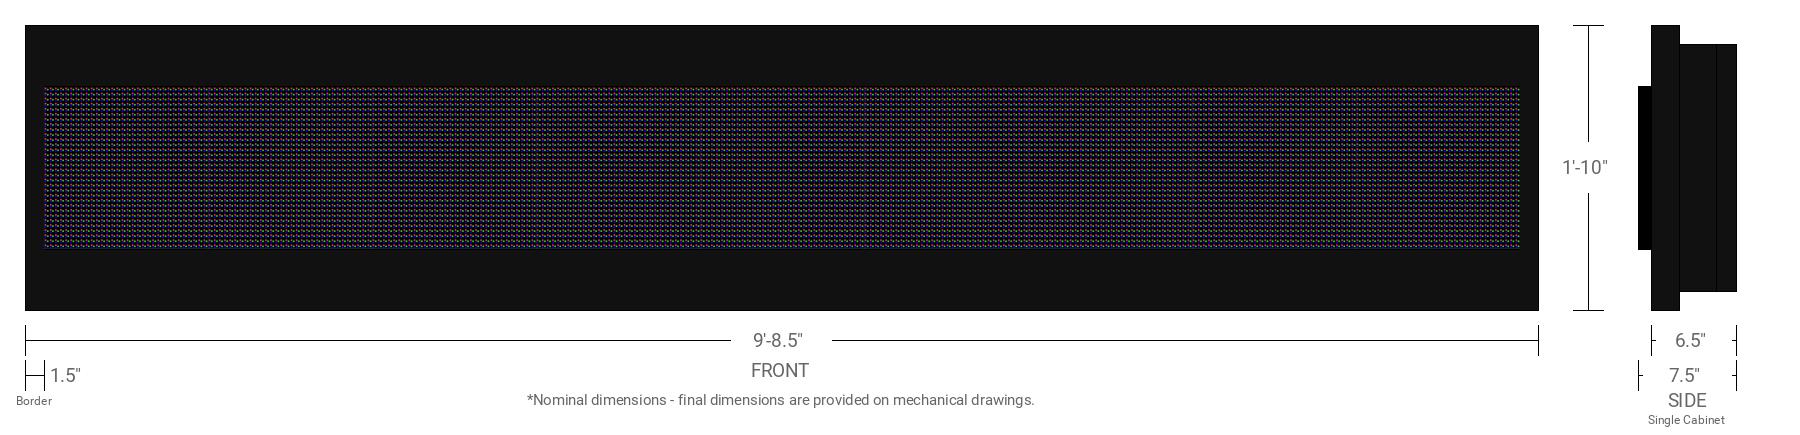 Aurora 10mm 32x288 Single Sided Full Color LED Display